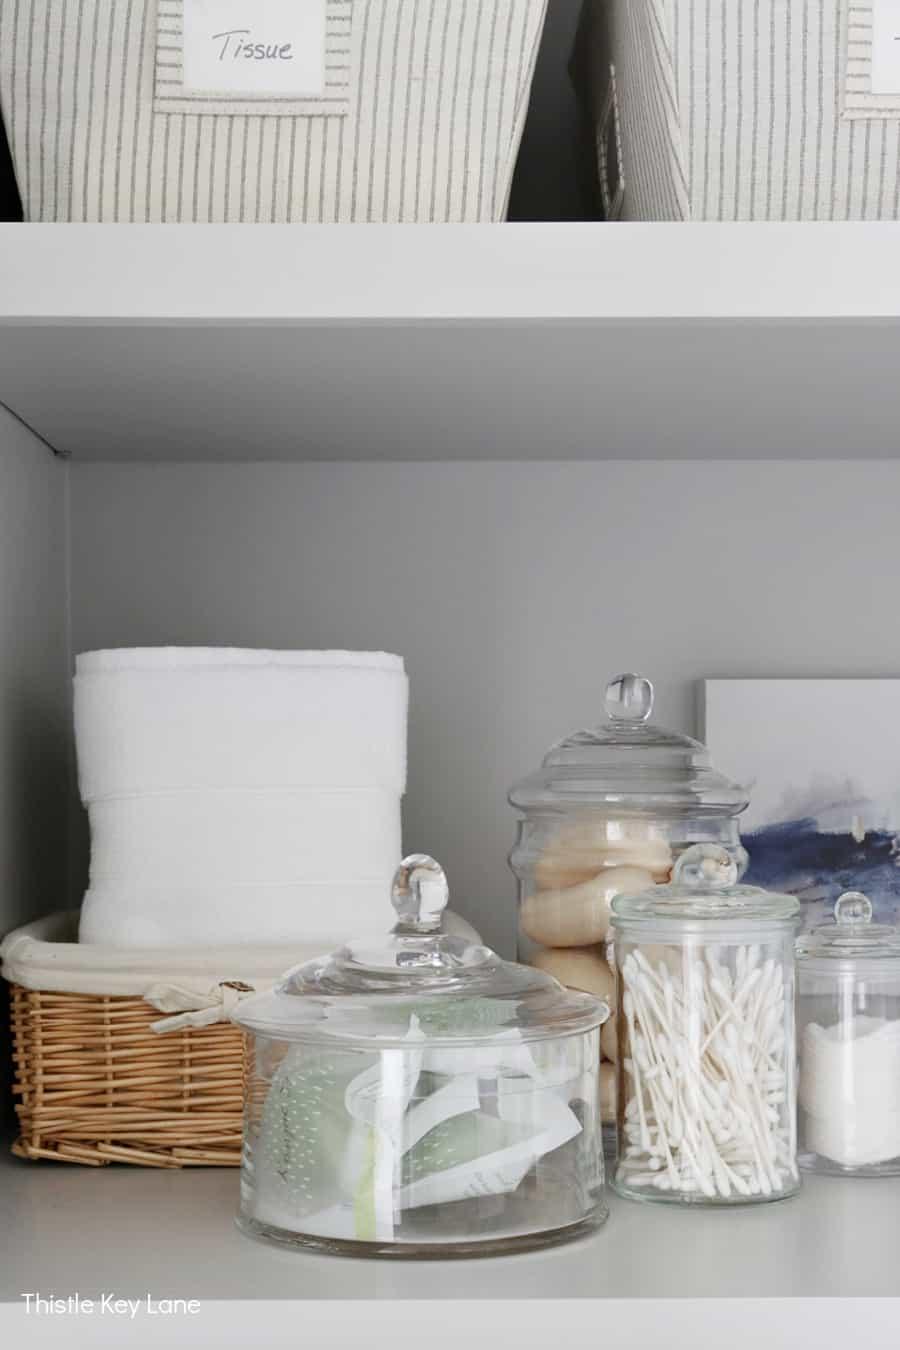 Glass storage jars on linen closet shelf. Organizing A Master Bathroom Linen Closet.